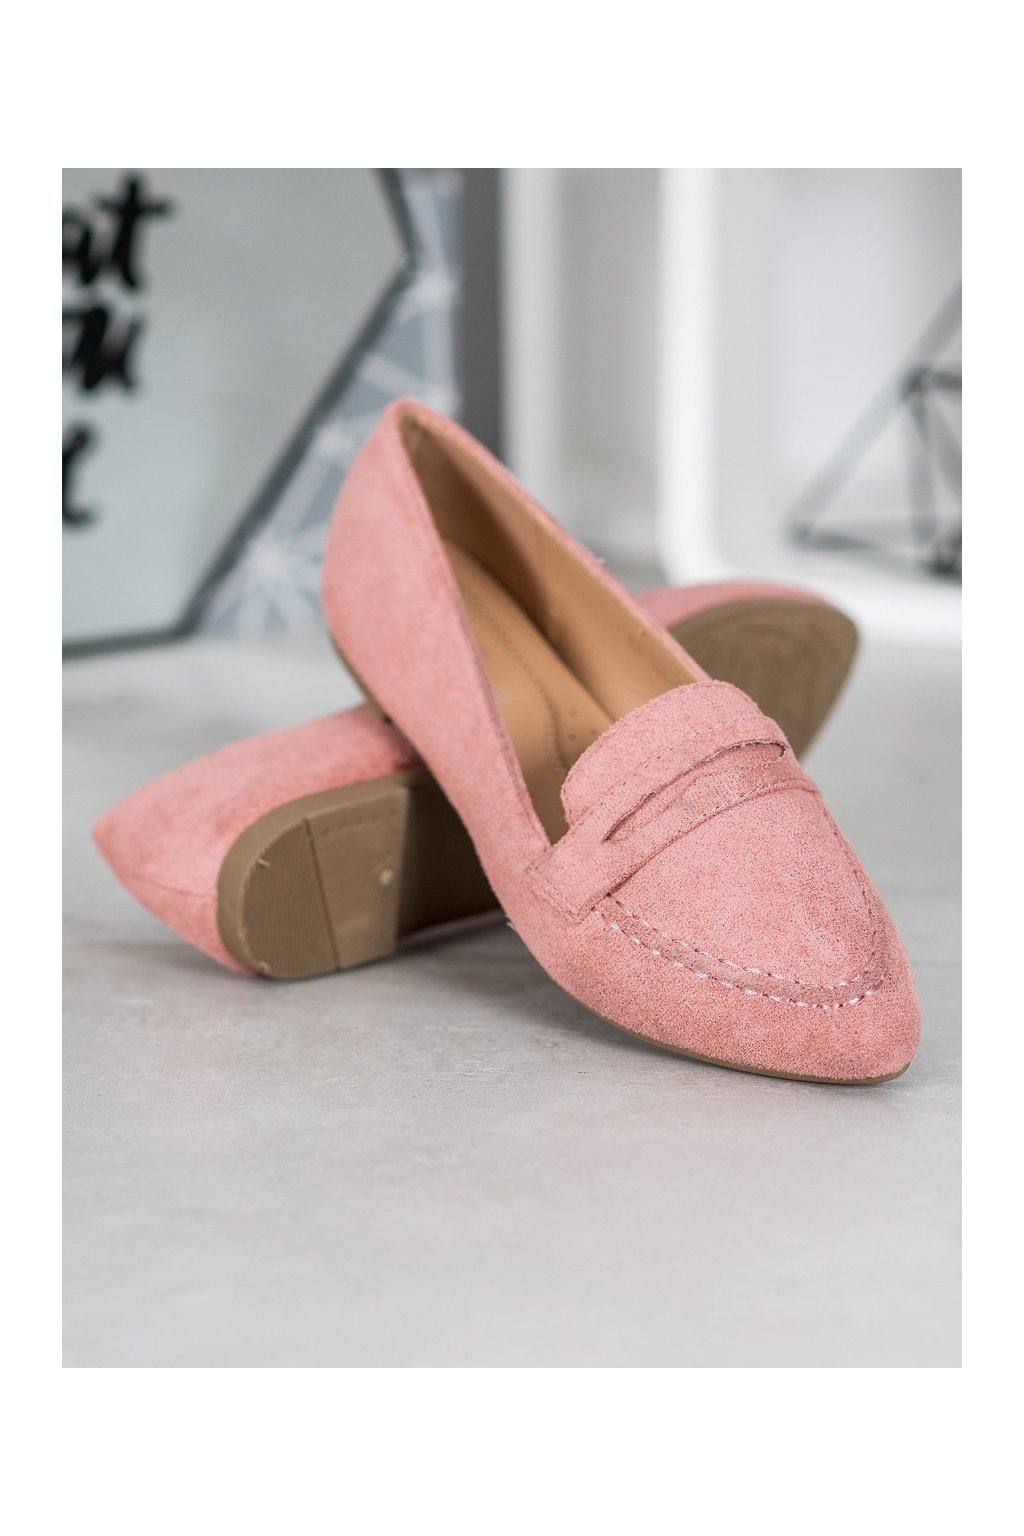 Ružové topánky - Best shoes kód CH-1M6P